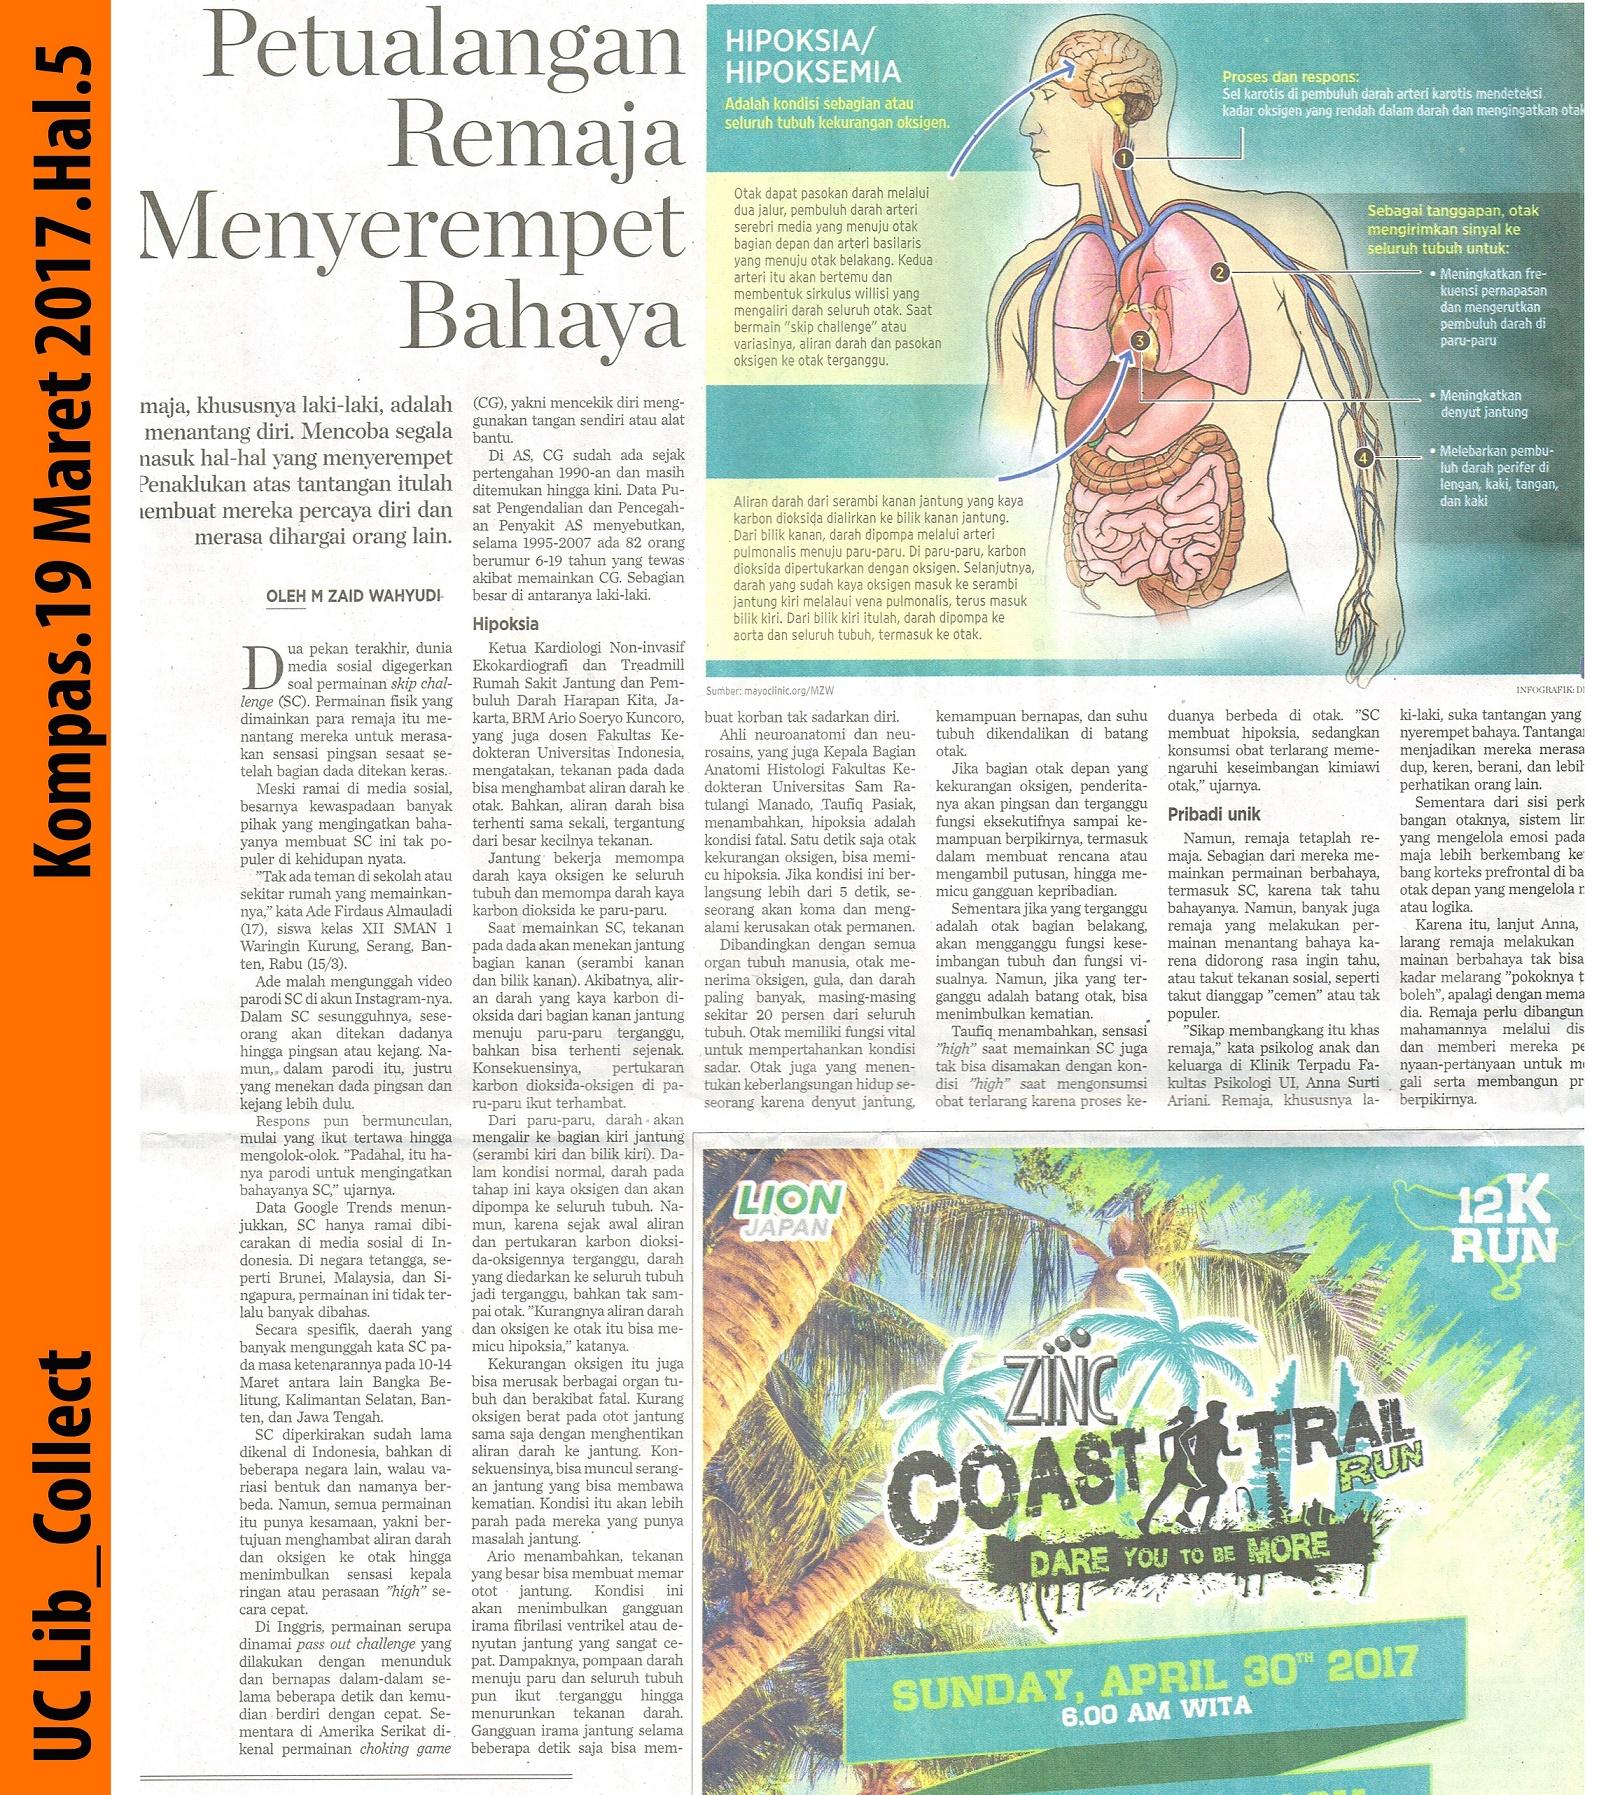 Petualangan Remaja Menyerempet Bahaya.Kompas.19 Maret 2017.Hal.5